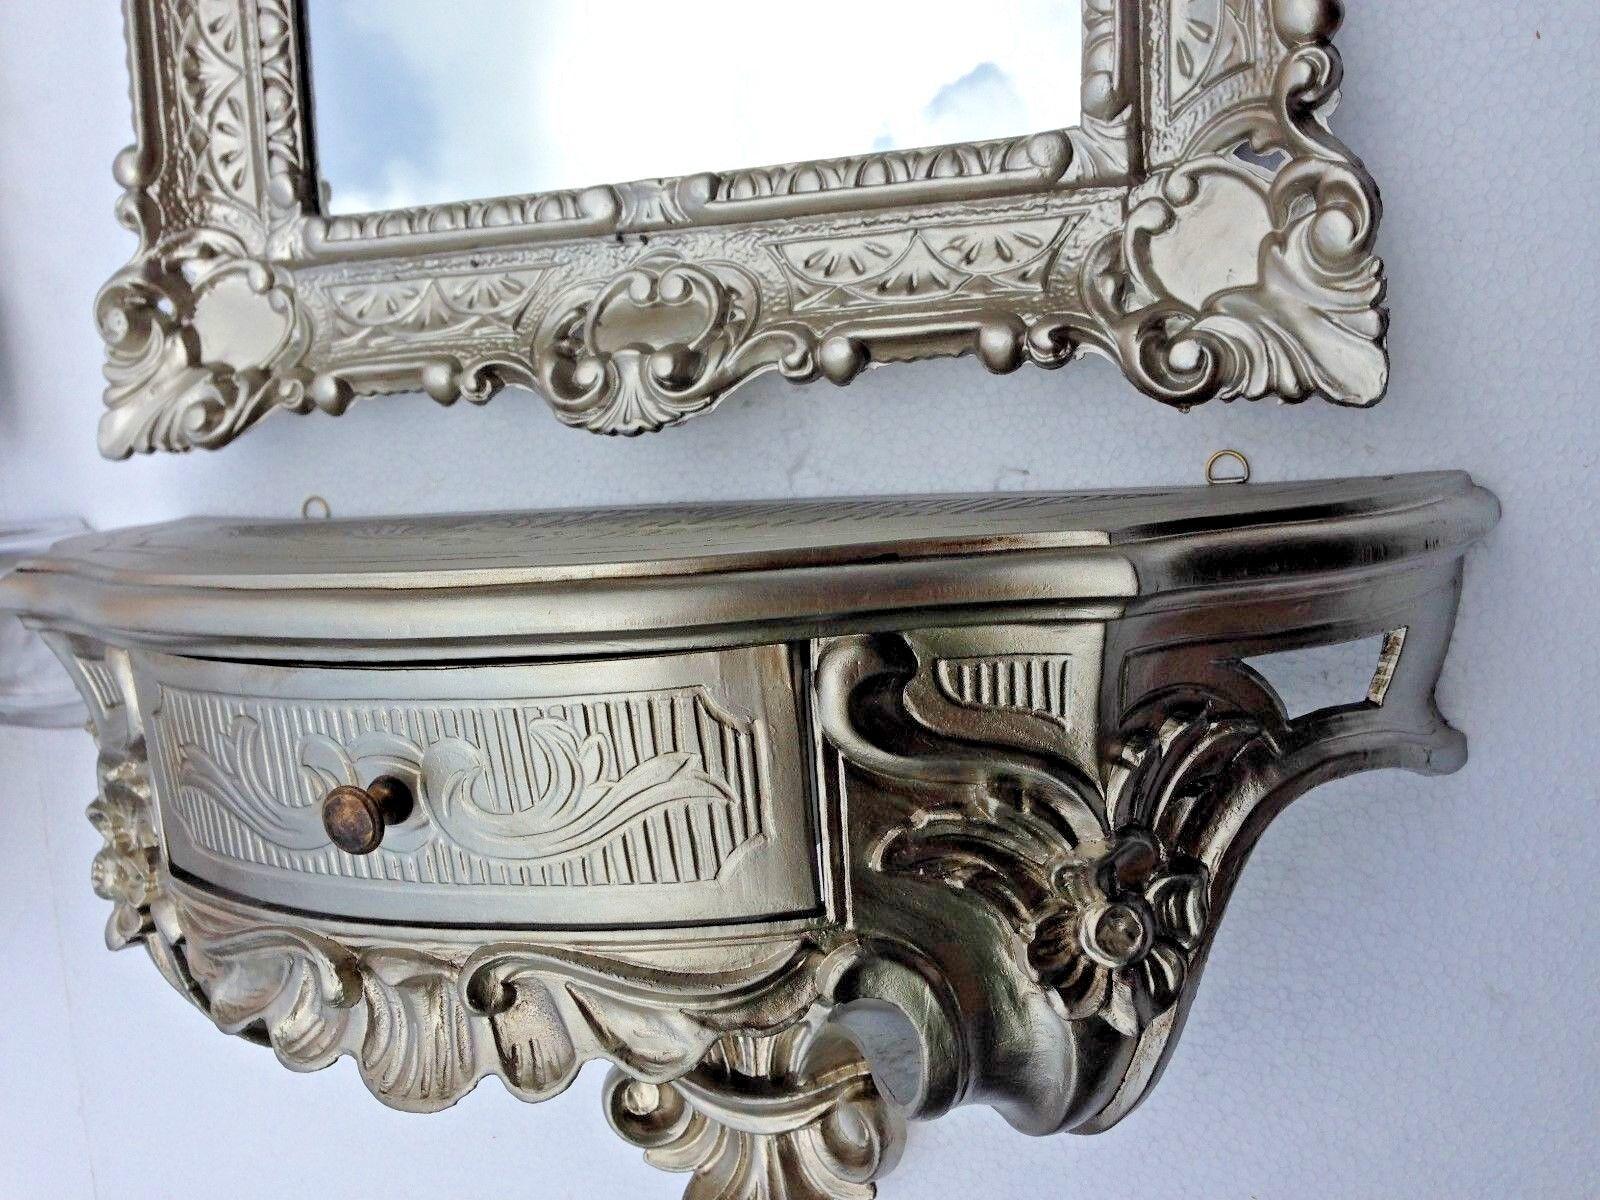 Wandkonsole Spiegelkonsolen Wandregal Alt Silber Barock 50x24x20